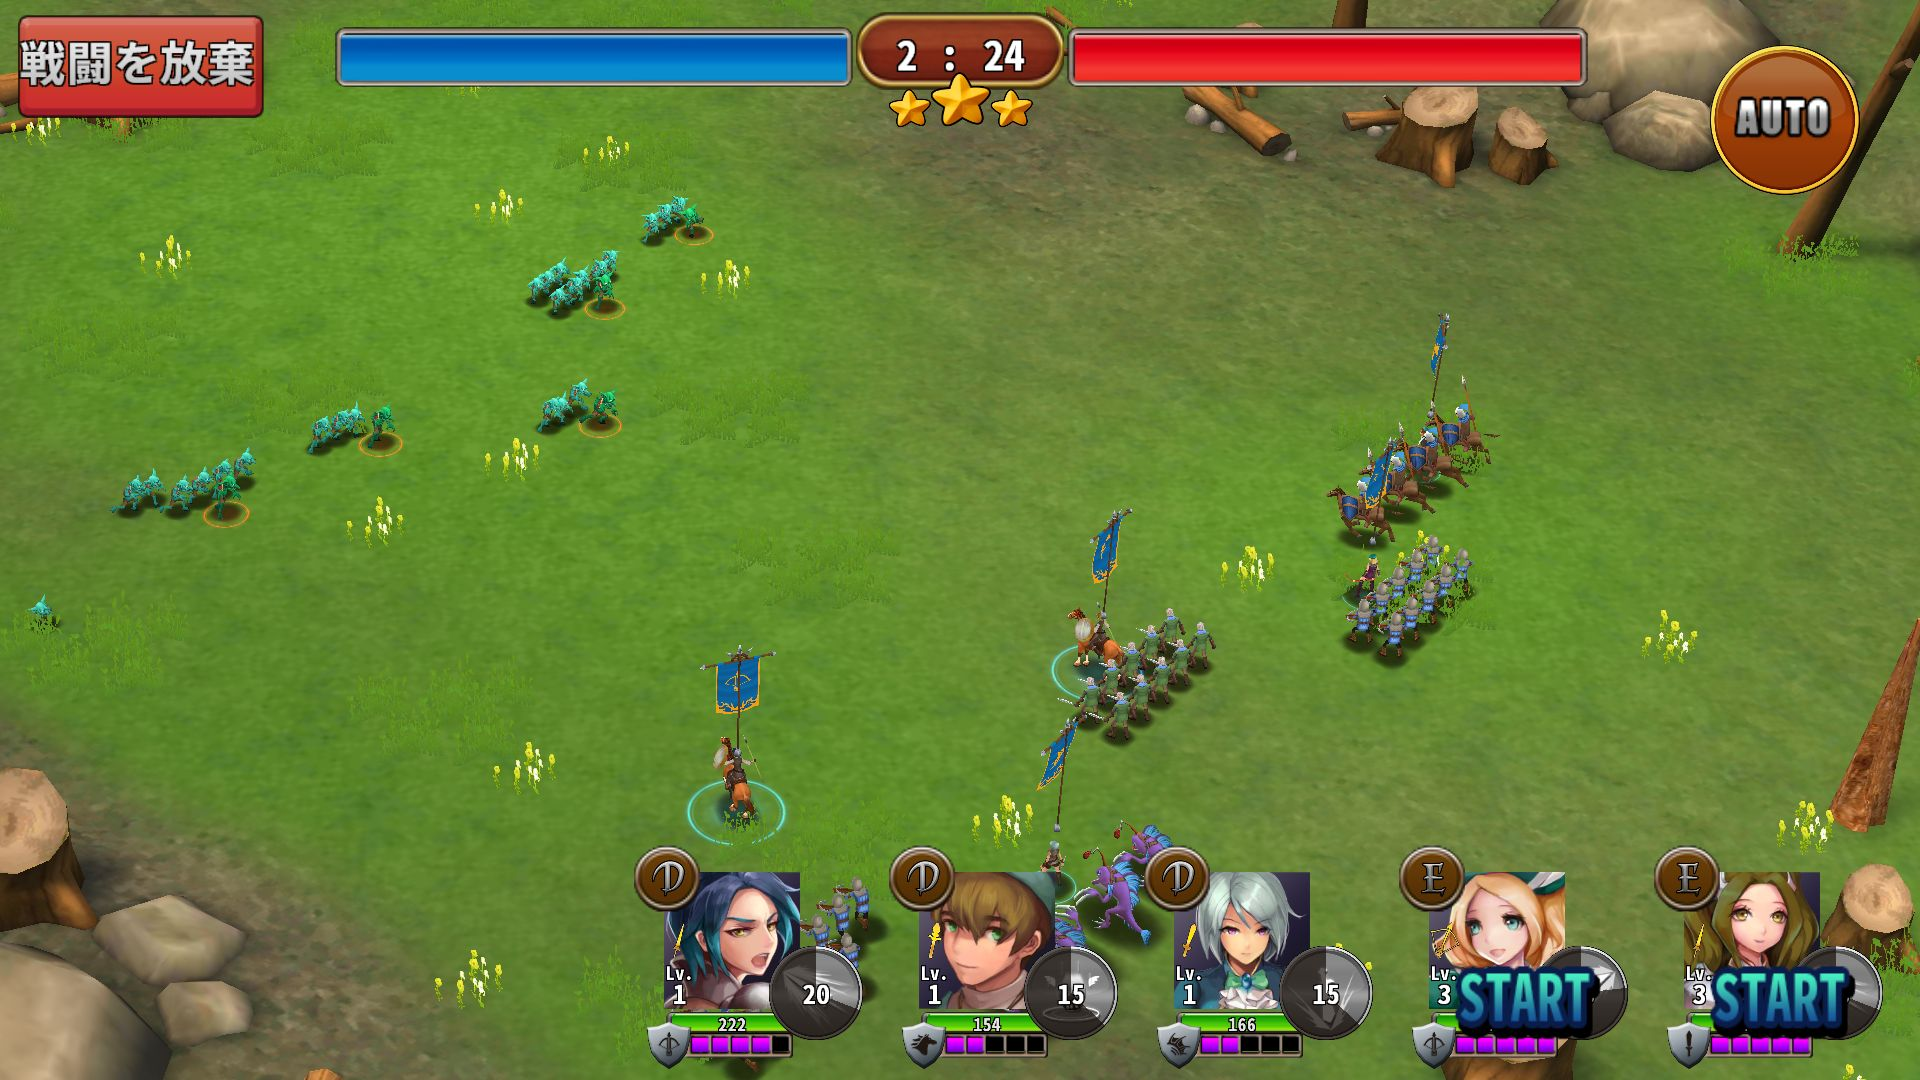 androidアプリ キングダムスレイヤー(Kingdom Slayer)攻略スクリーンショット4